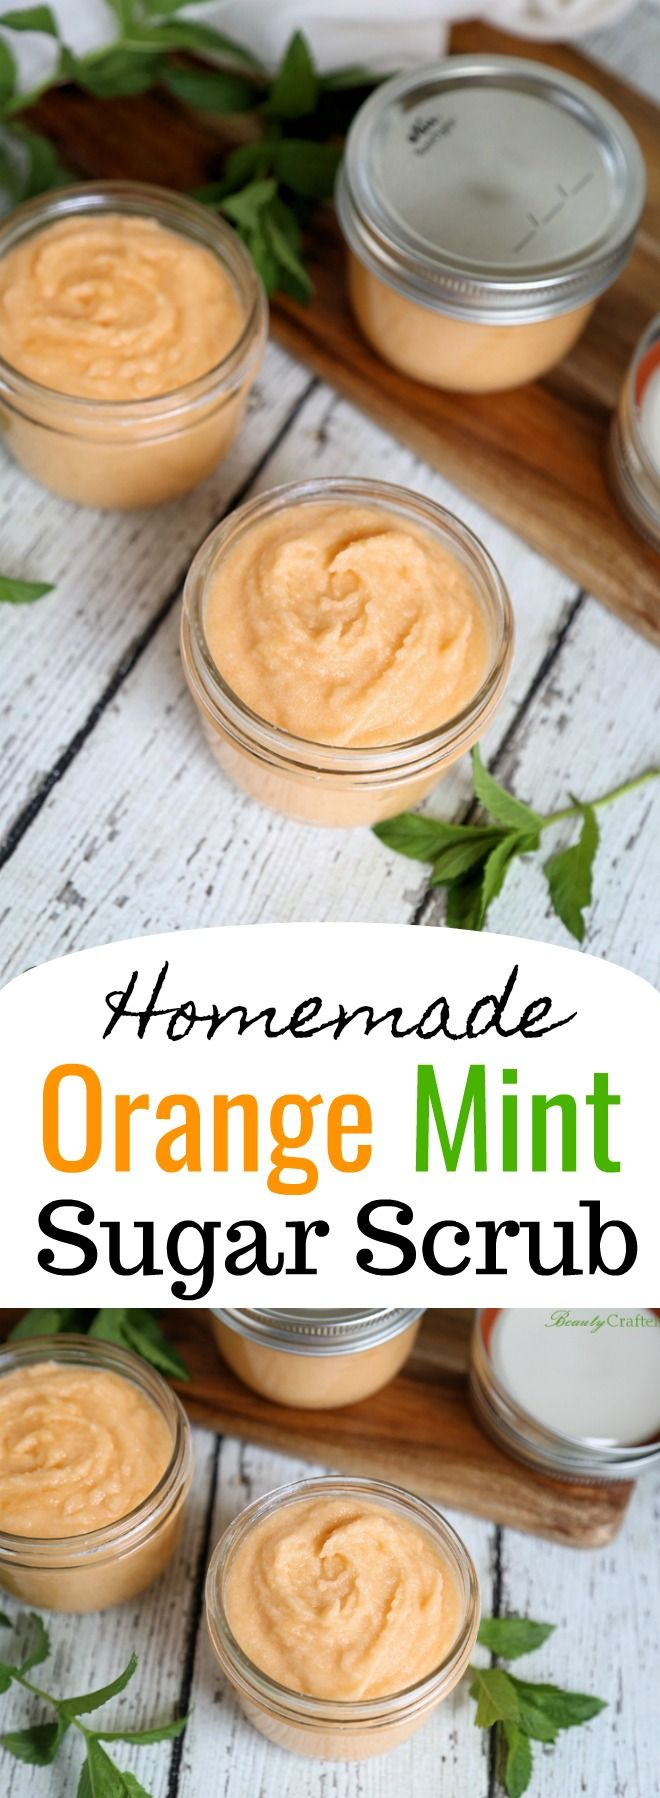 Homemade Orange Mint Sugar Scrub Recipe - Beauty Crafter